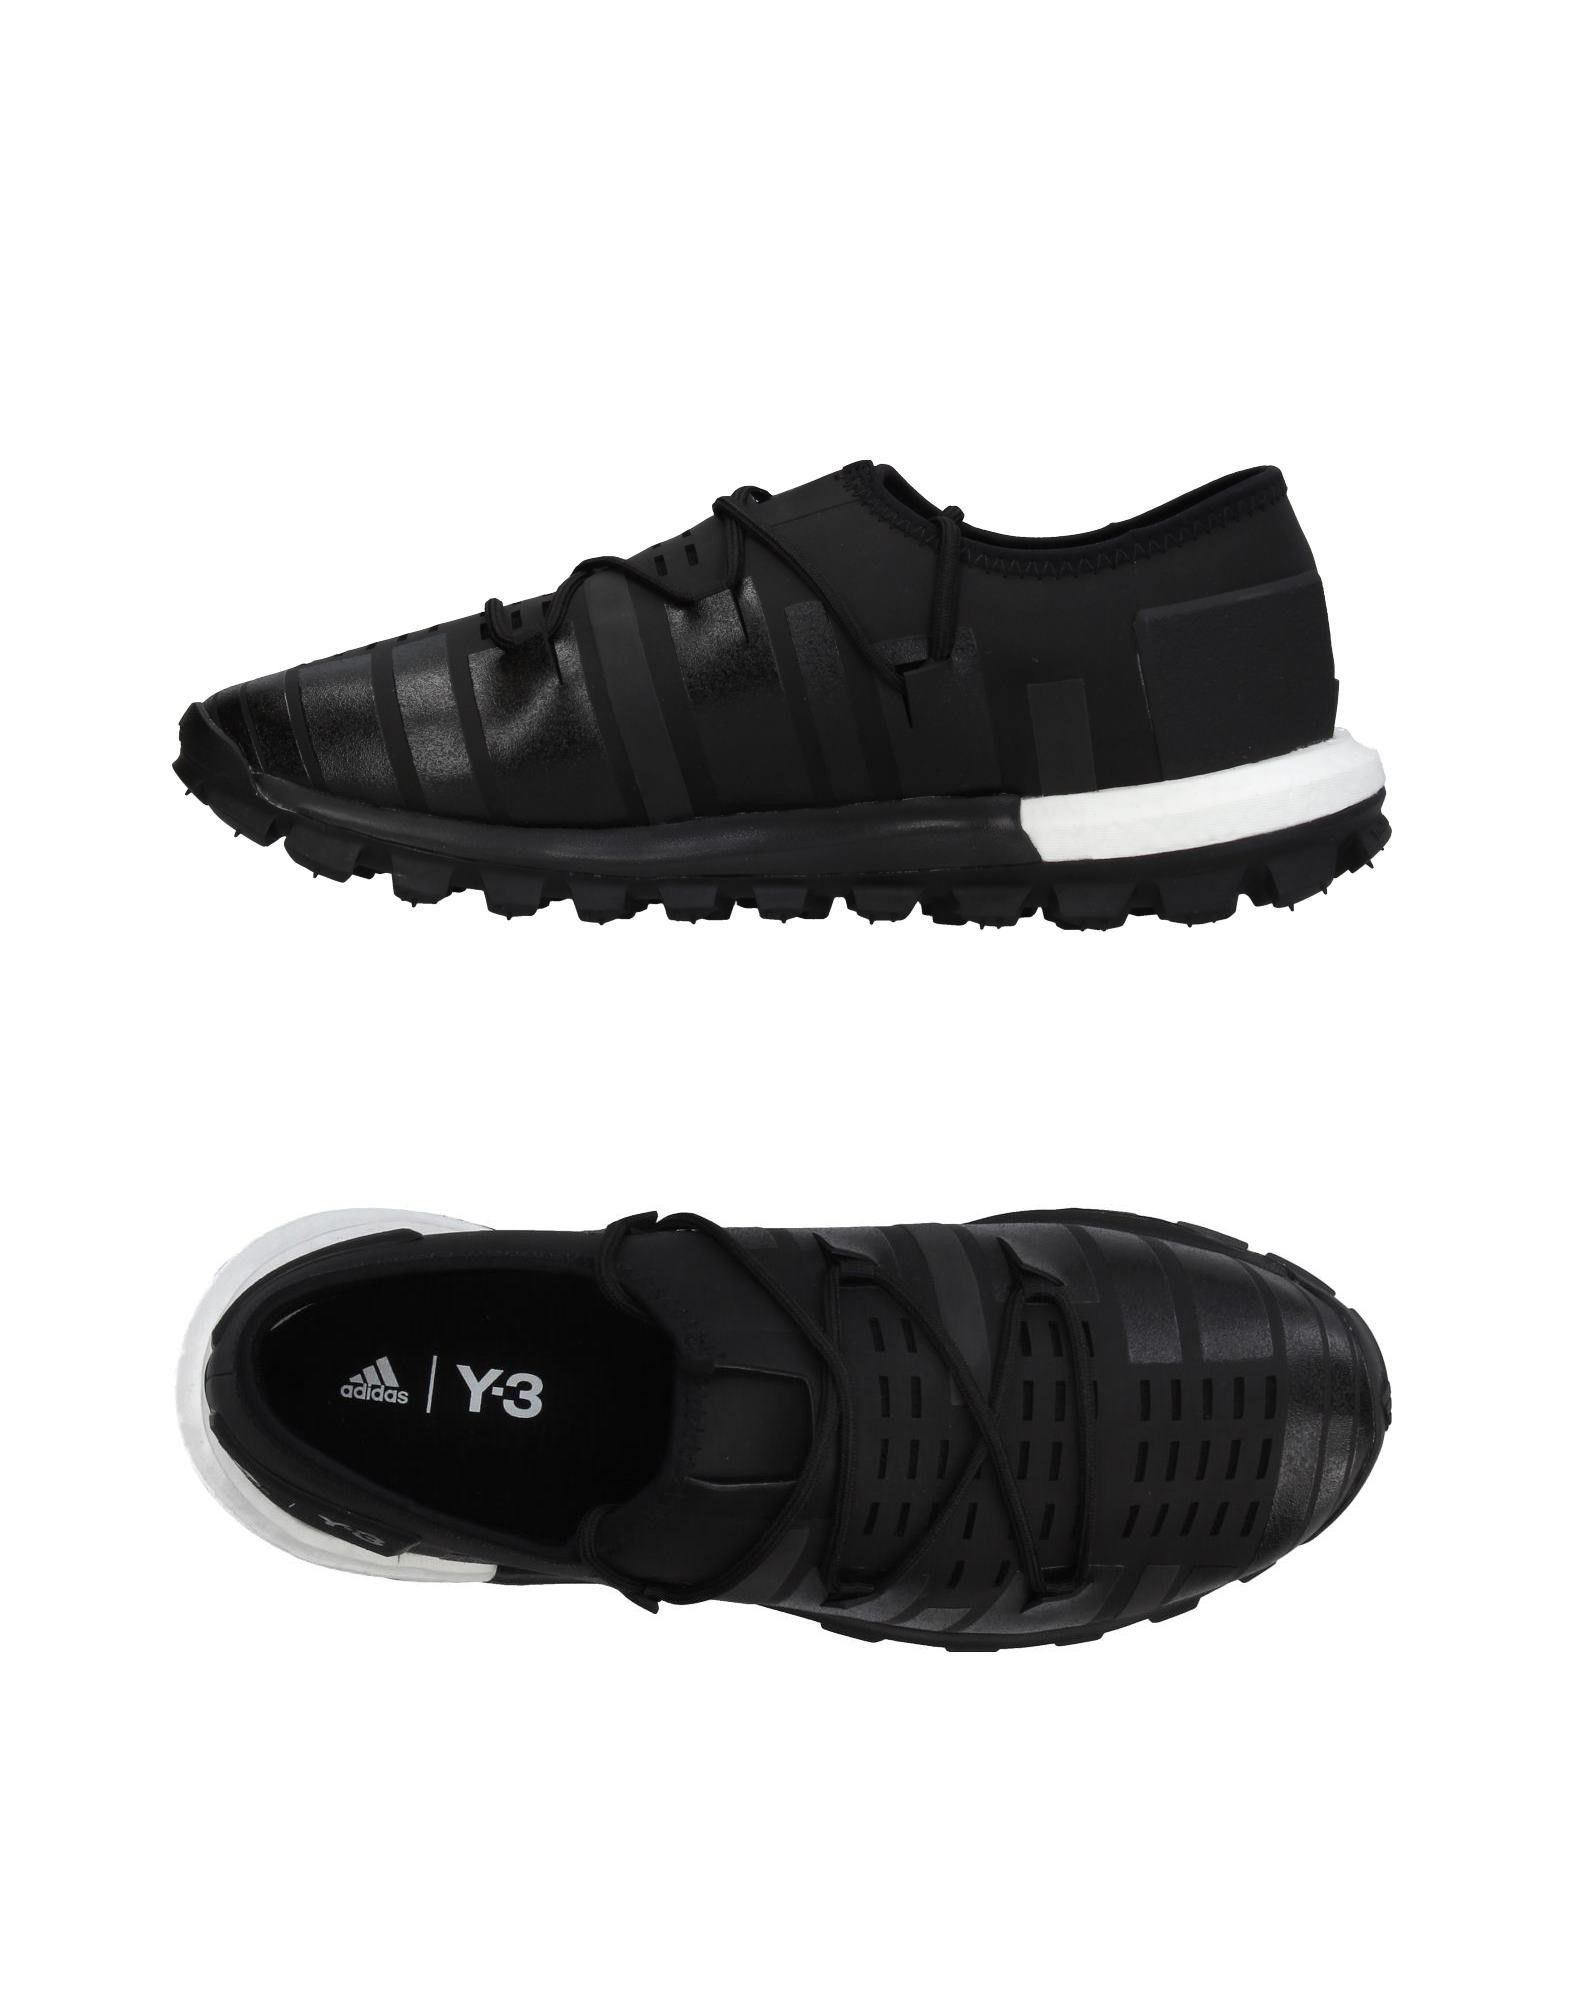 Sneakers Uomo online Acquista Y 3 su fHRqrf